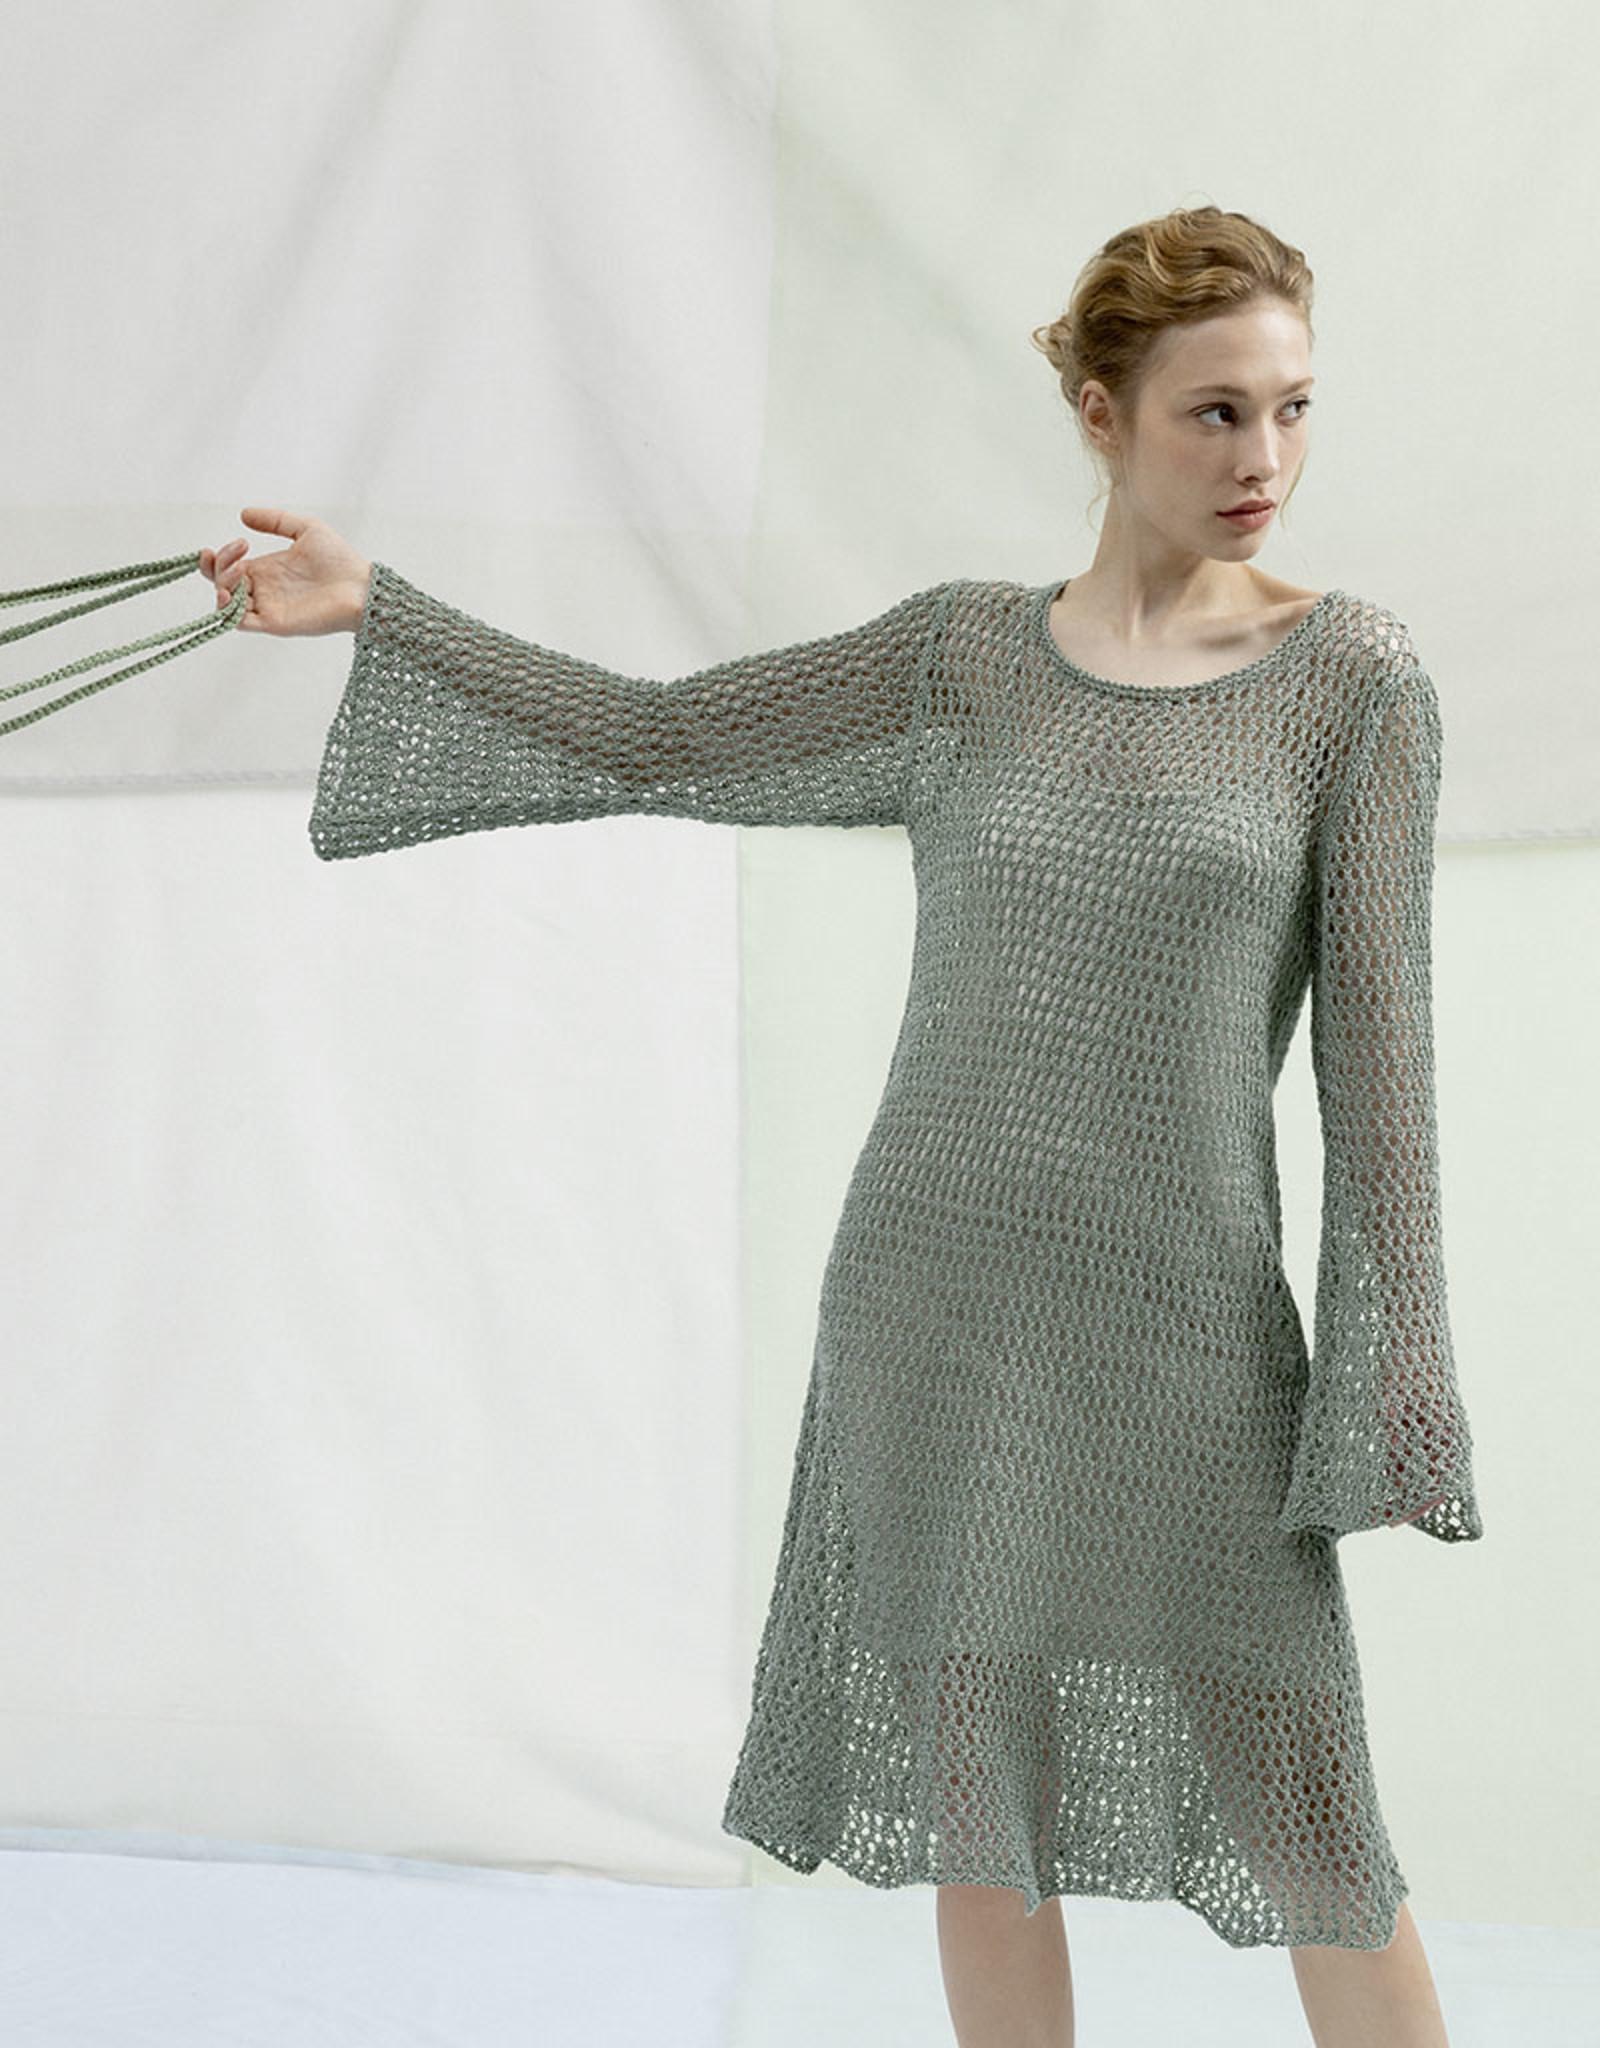 Angels-Knit by FDF Breipakket Jurk Canapa 071 - Medium